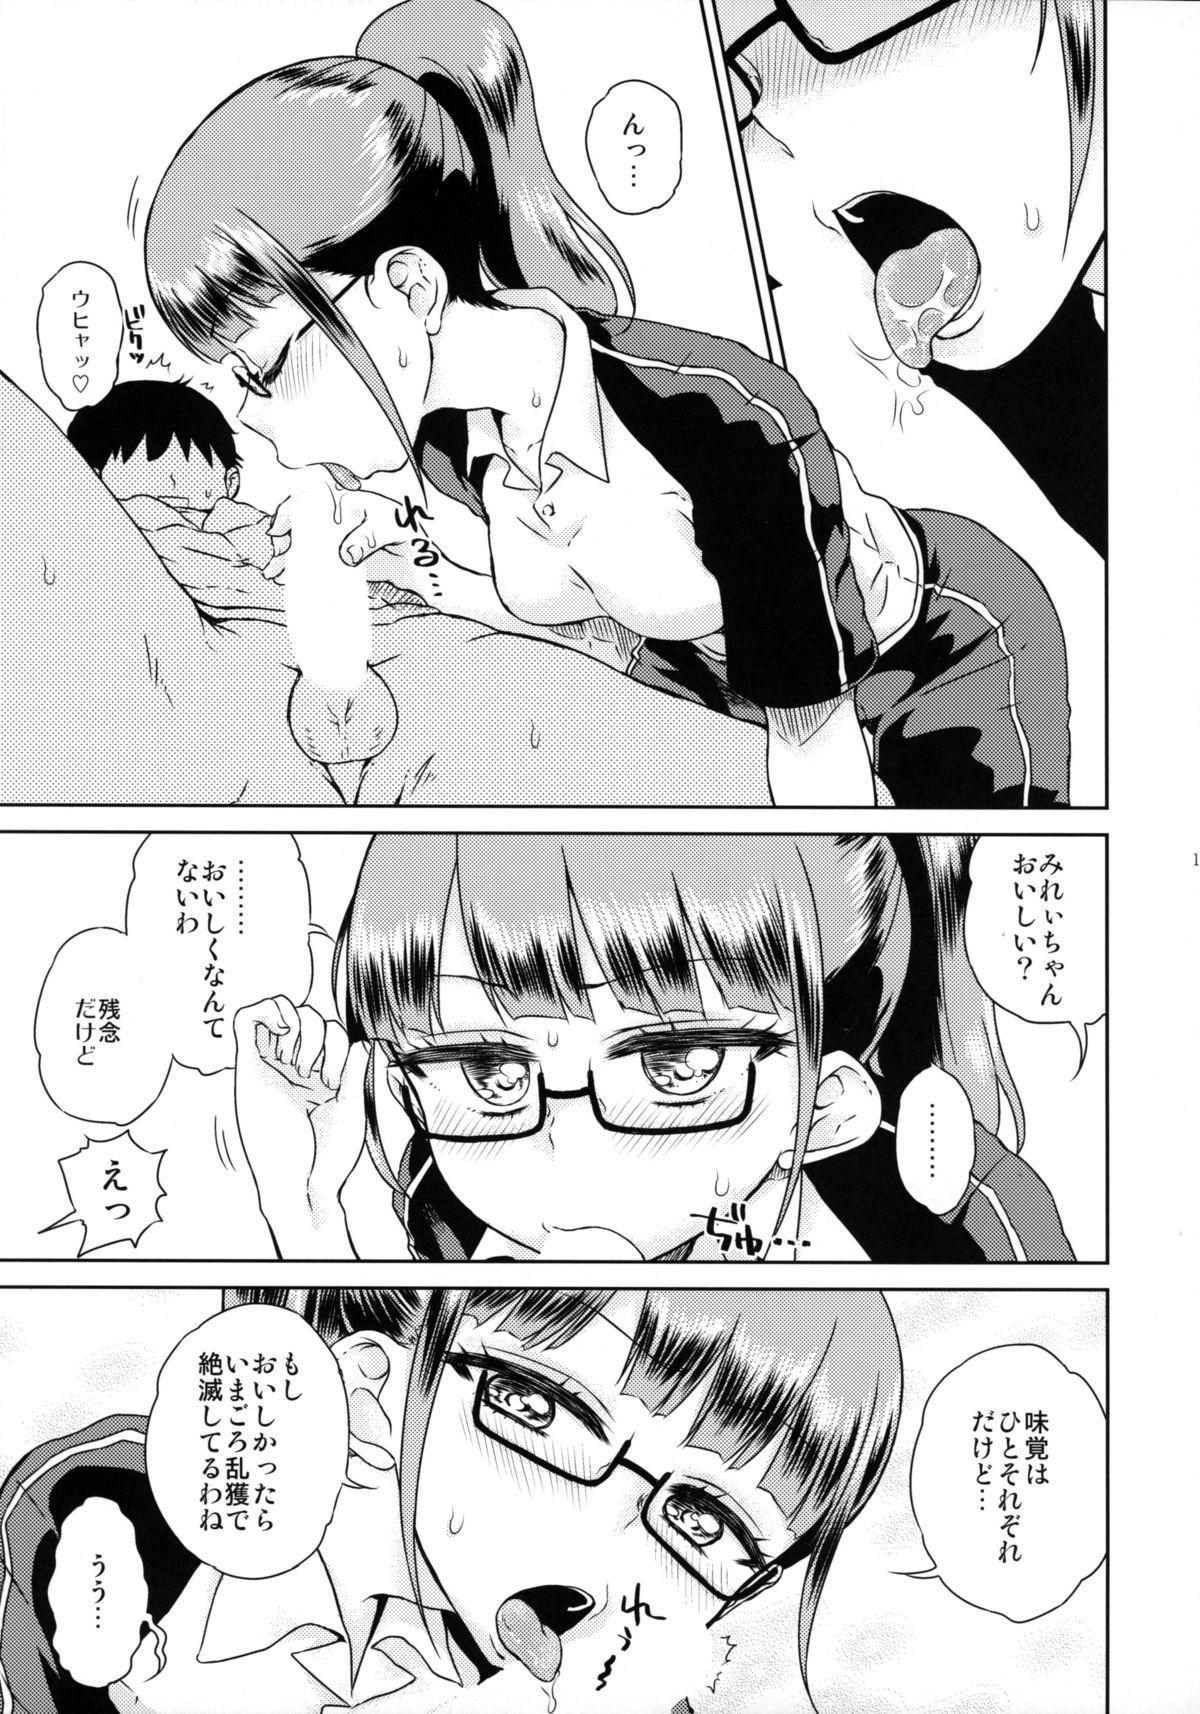 Mirei-chan to Love Love 2 11